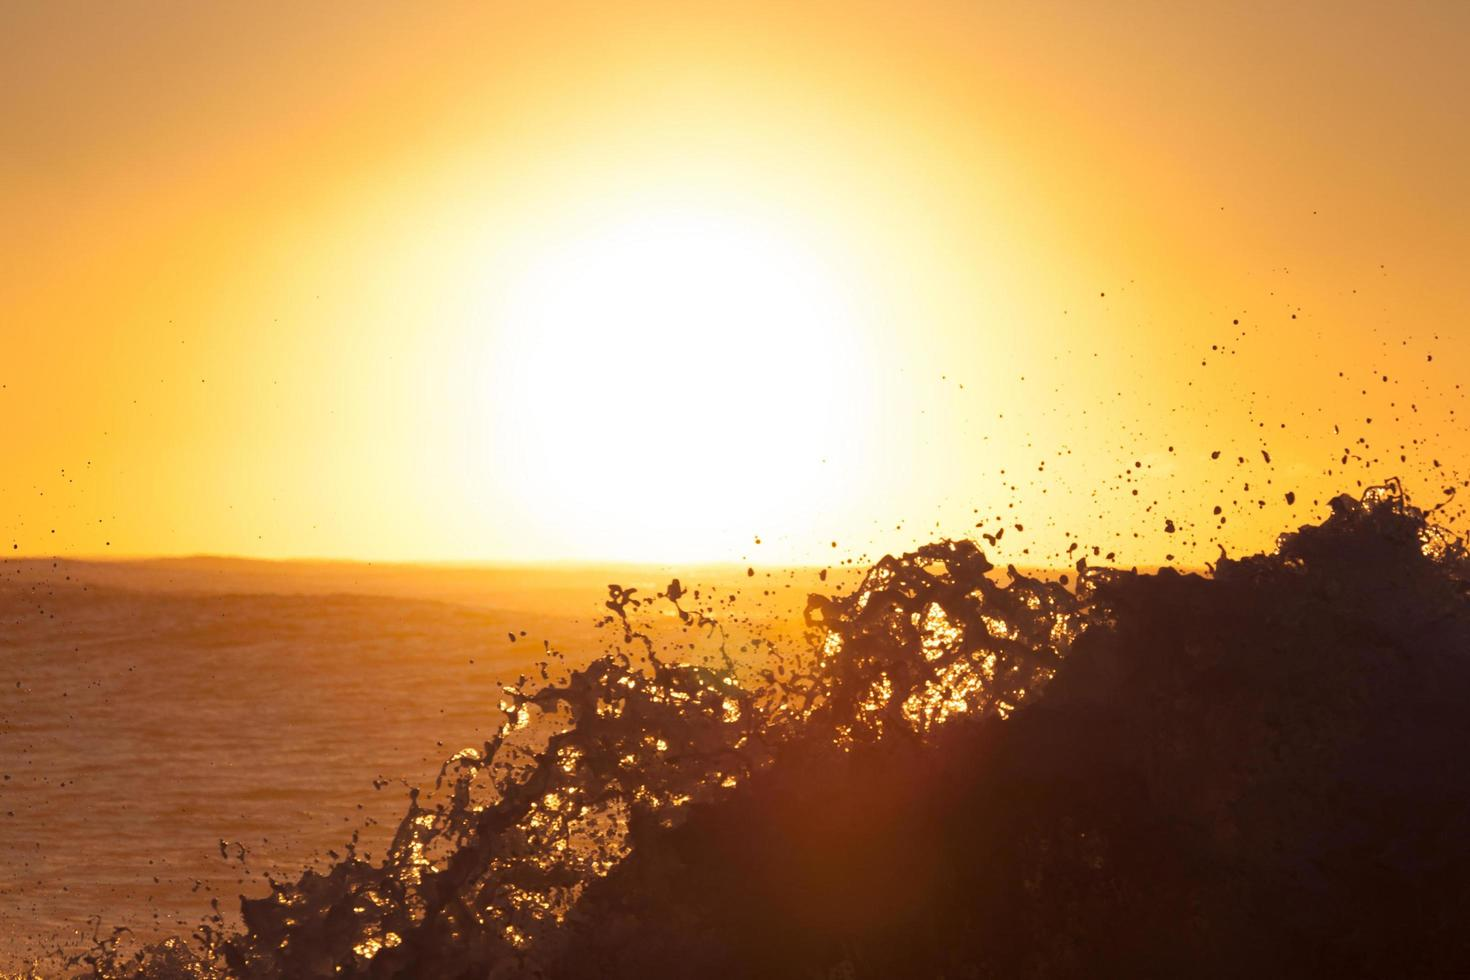 Ocean waves at golden hour photo